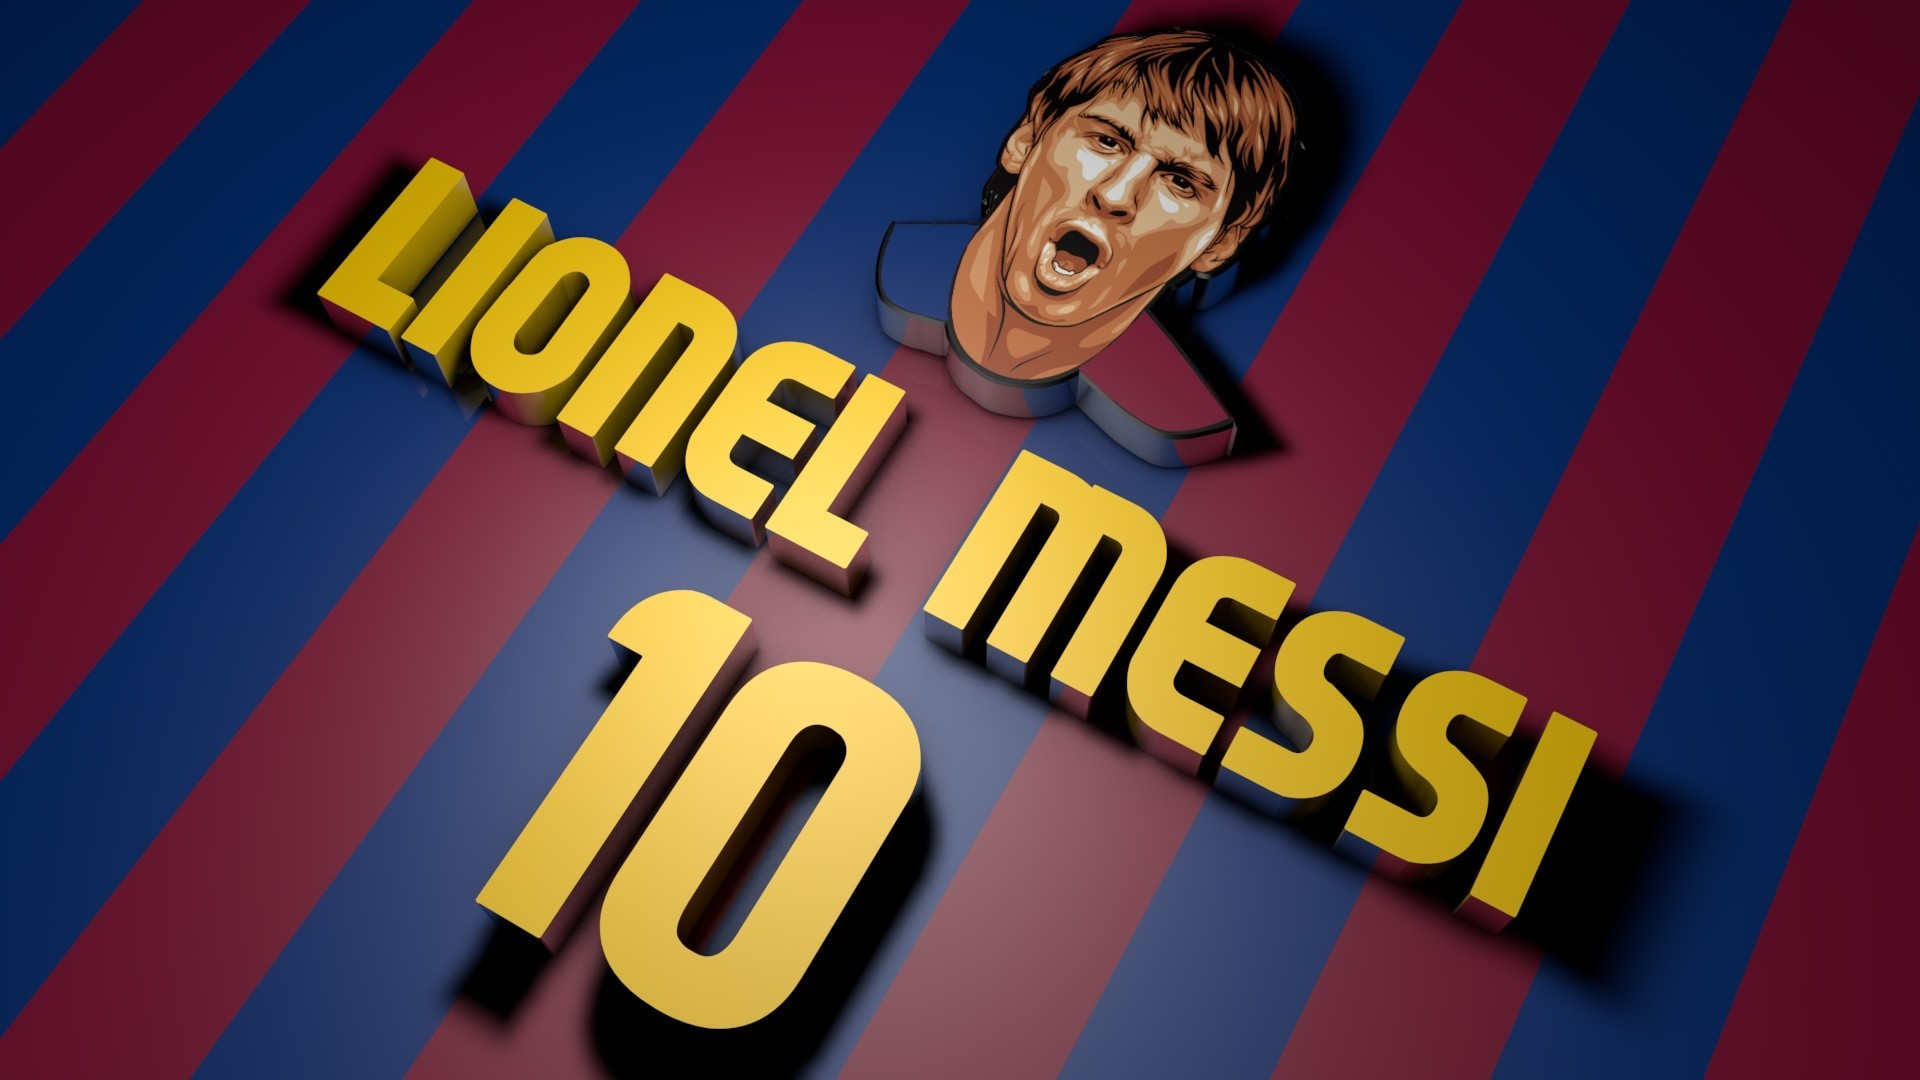 Lionel Messi 10 HD Desktop Mobile Wallpaper Background   9walls 1920x1080